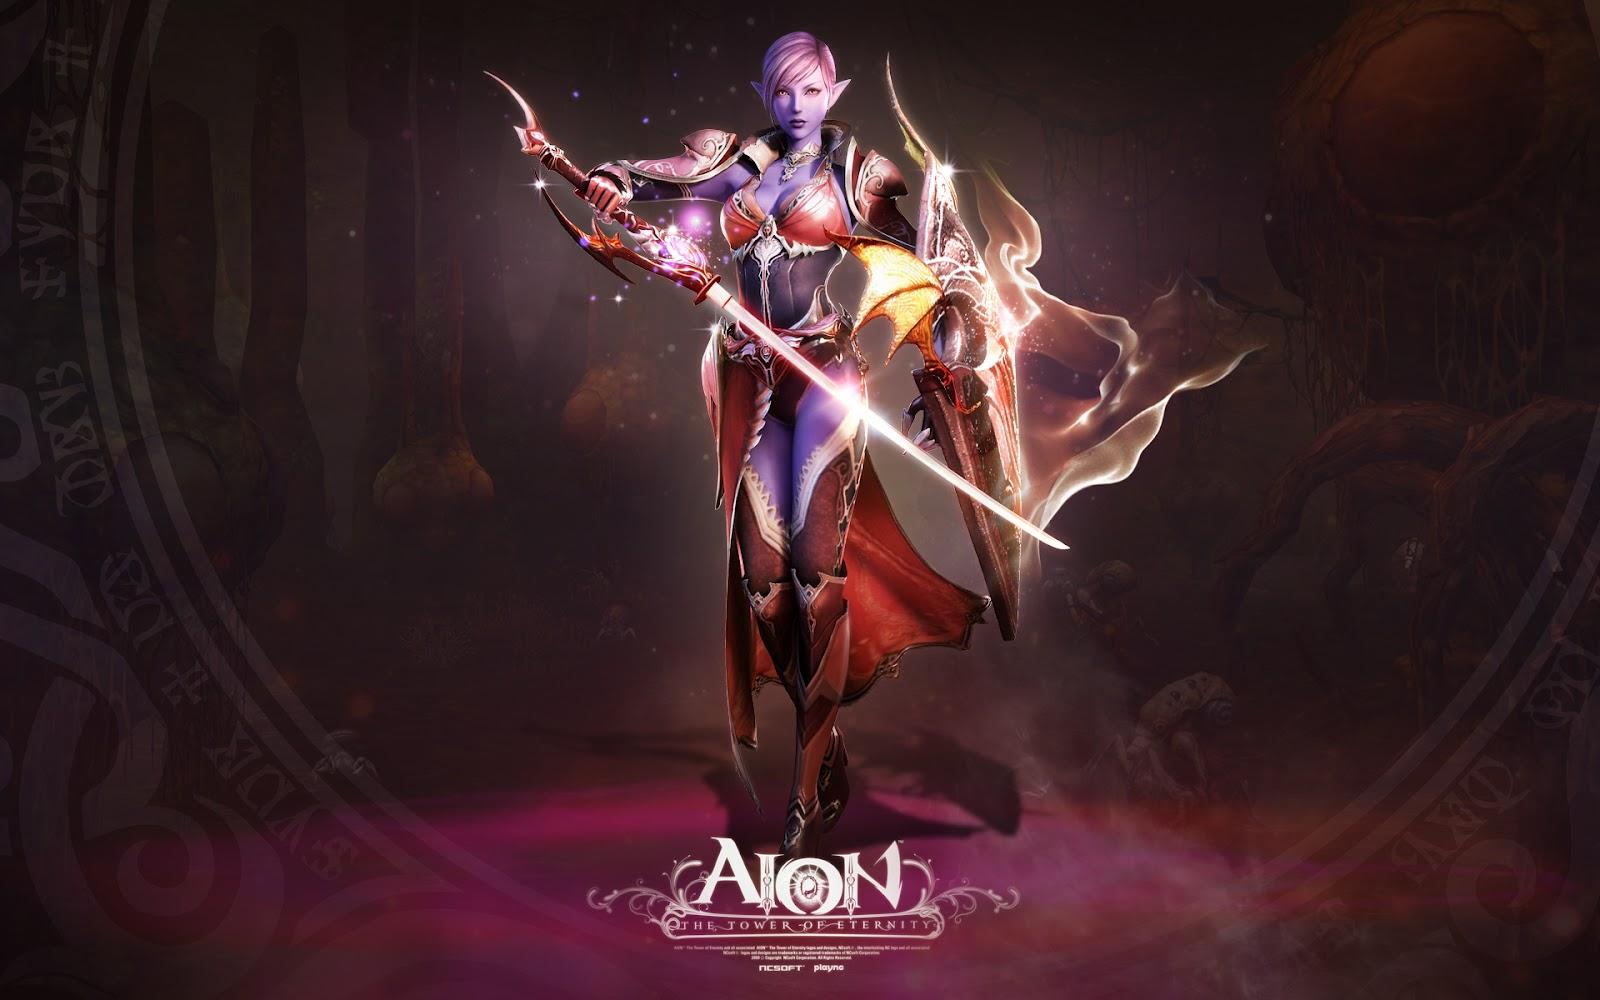 http://1.bp.blogspot.com/-uRNJN4tCLKk/UBM8eR5_5kI/AAAAAAAADwQ/BMsceNDdaWs/s1600/Aion+Online+wallpapers_templar_asmo.jpg